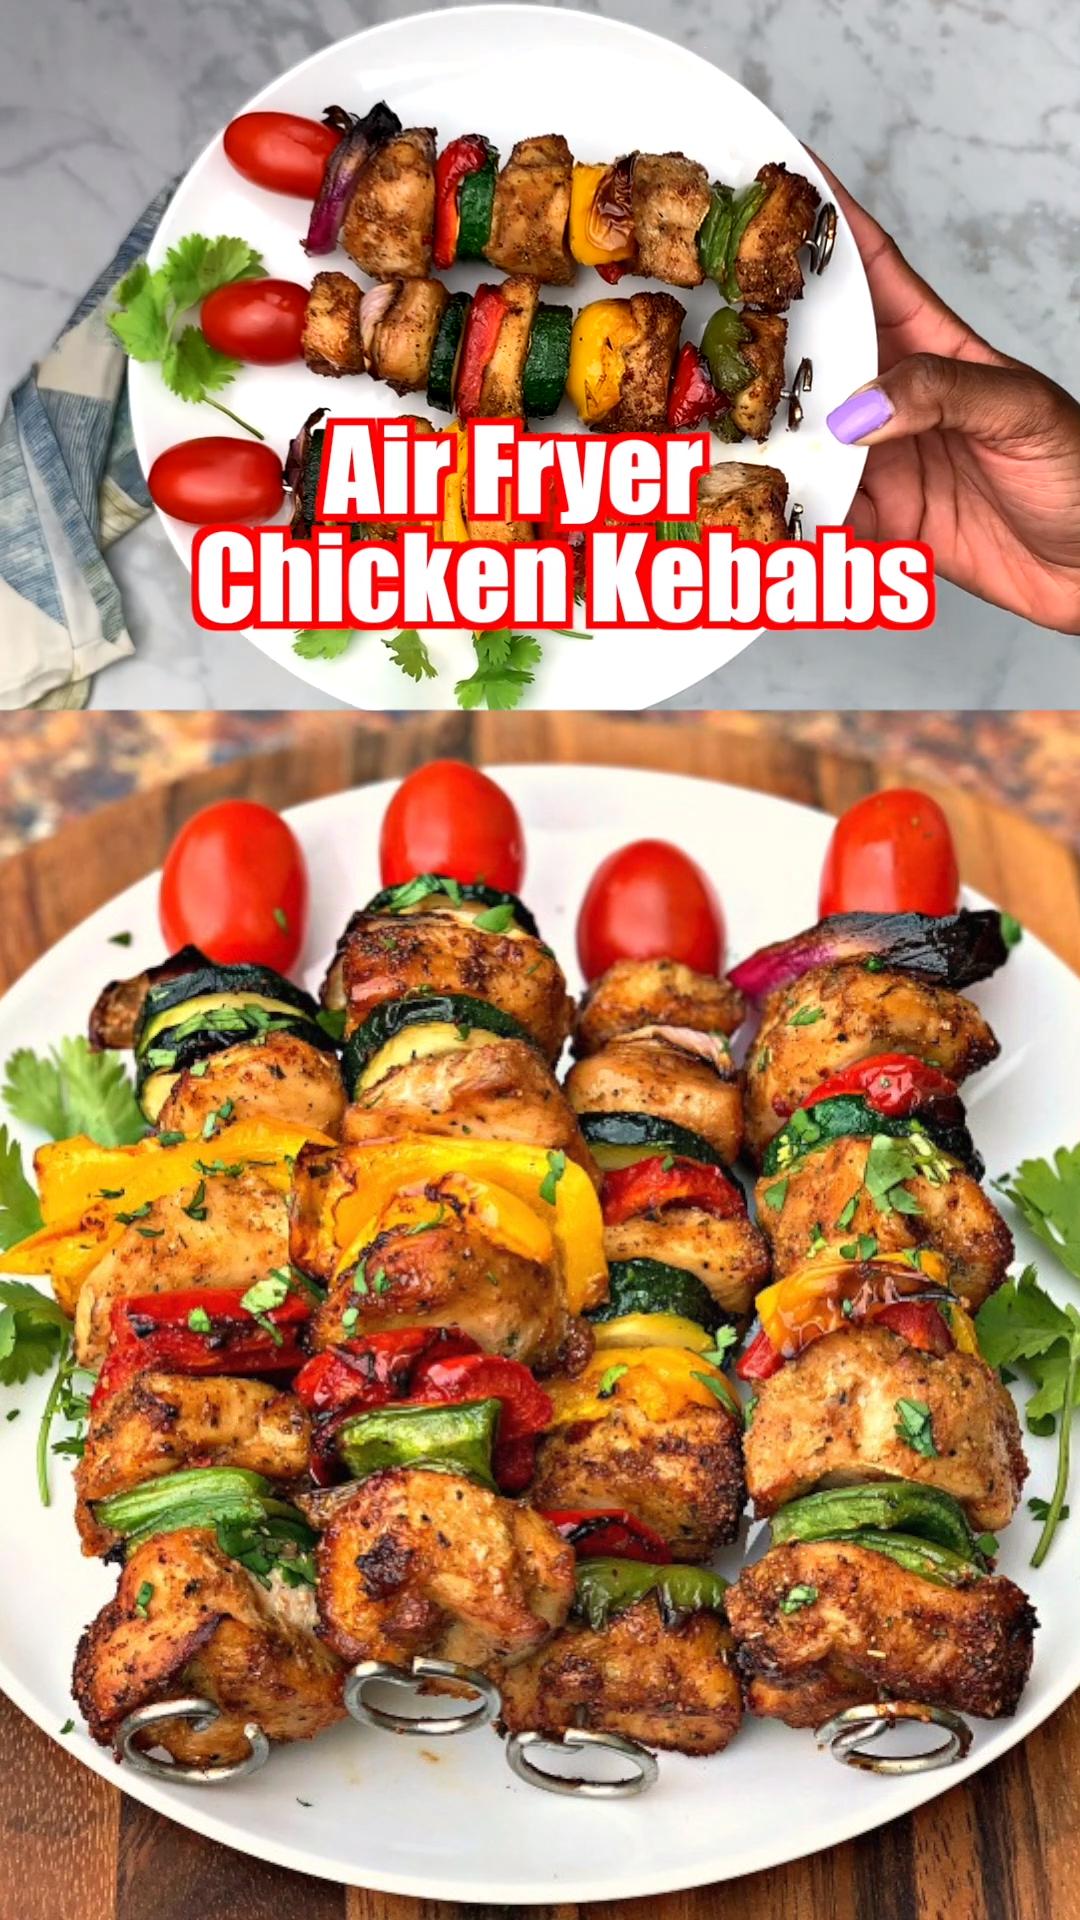 Easy, Air Fryer Grilled Chicken Kebabs -   19 air fryer recipes chicken boneless keto ideas